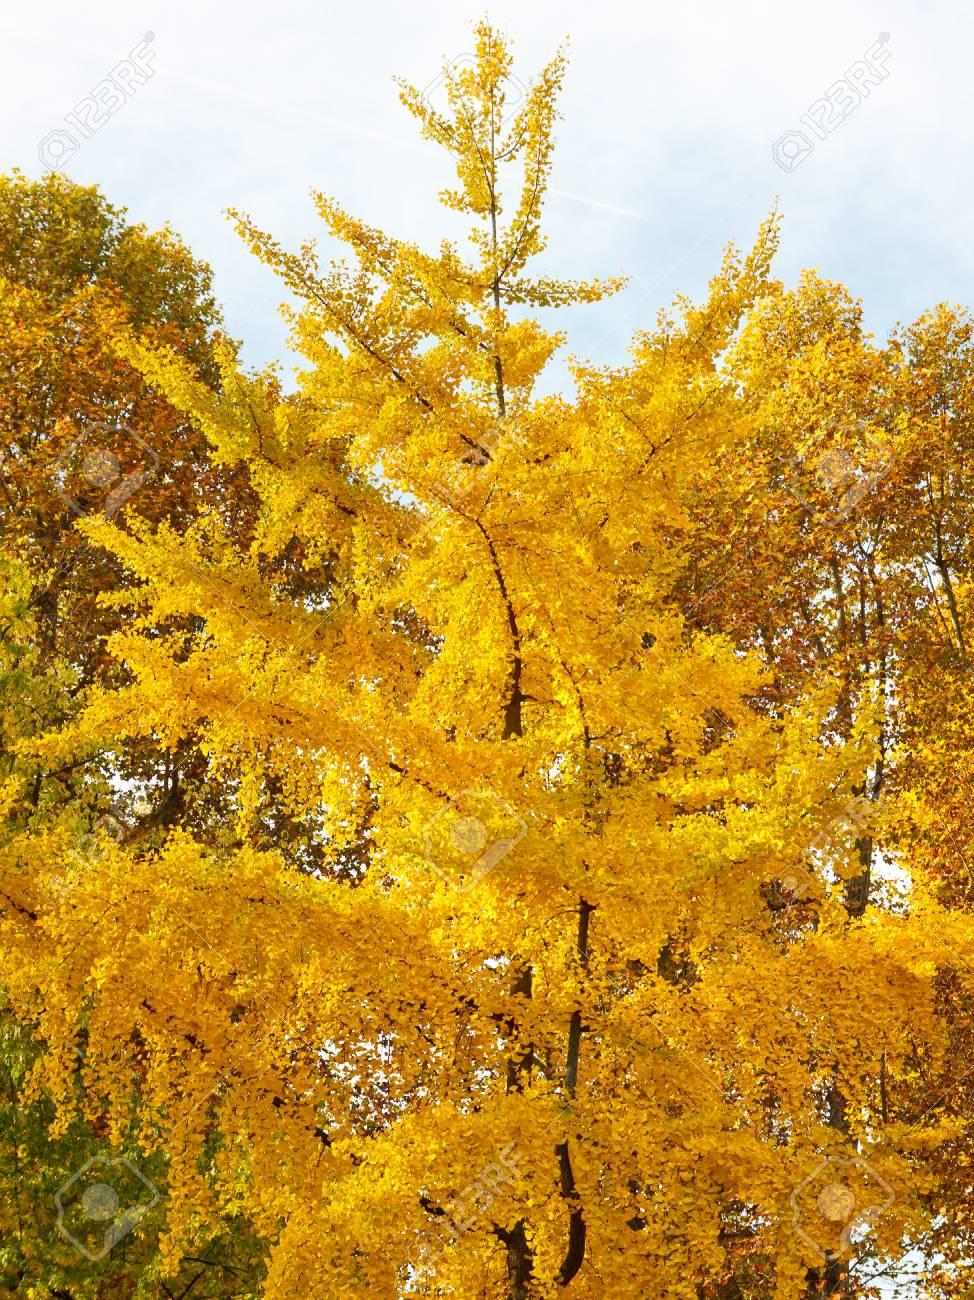 Fall Foliage Scenery - Tree with intense fall colors. Stock Photo - 17546280